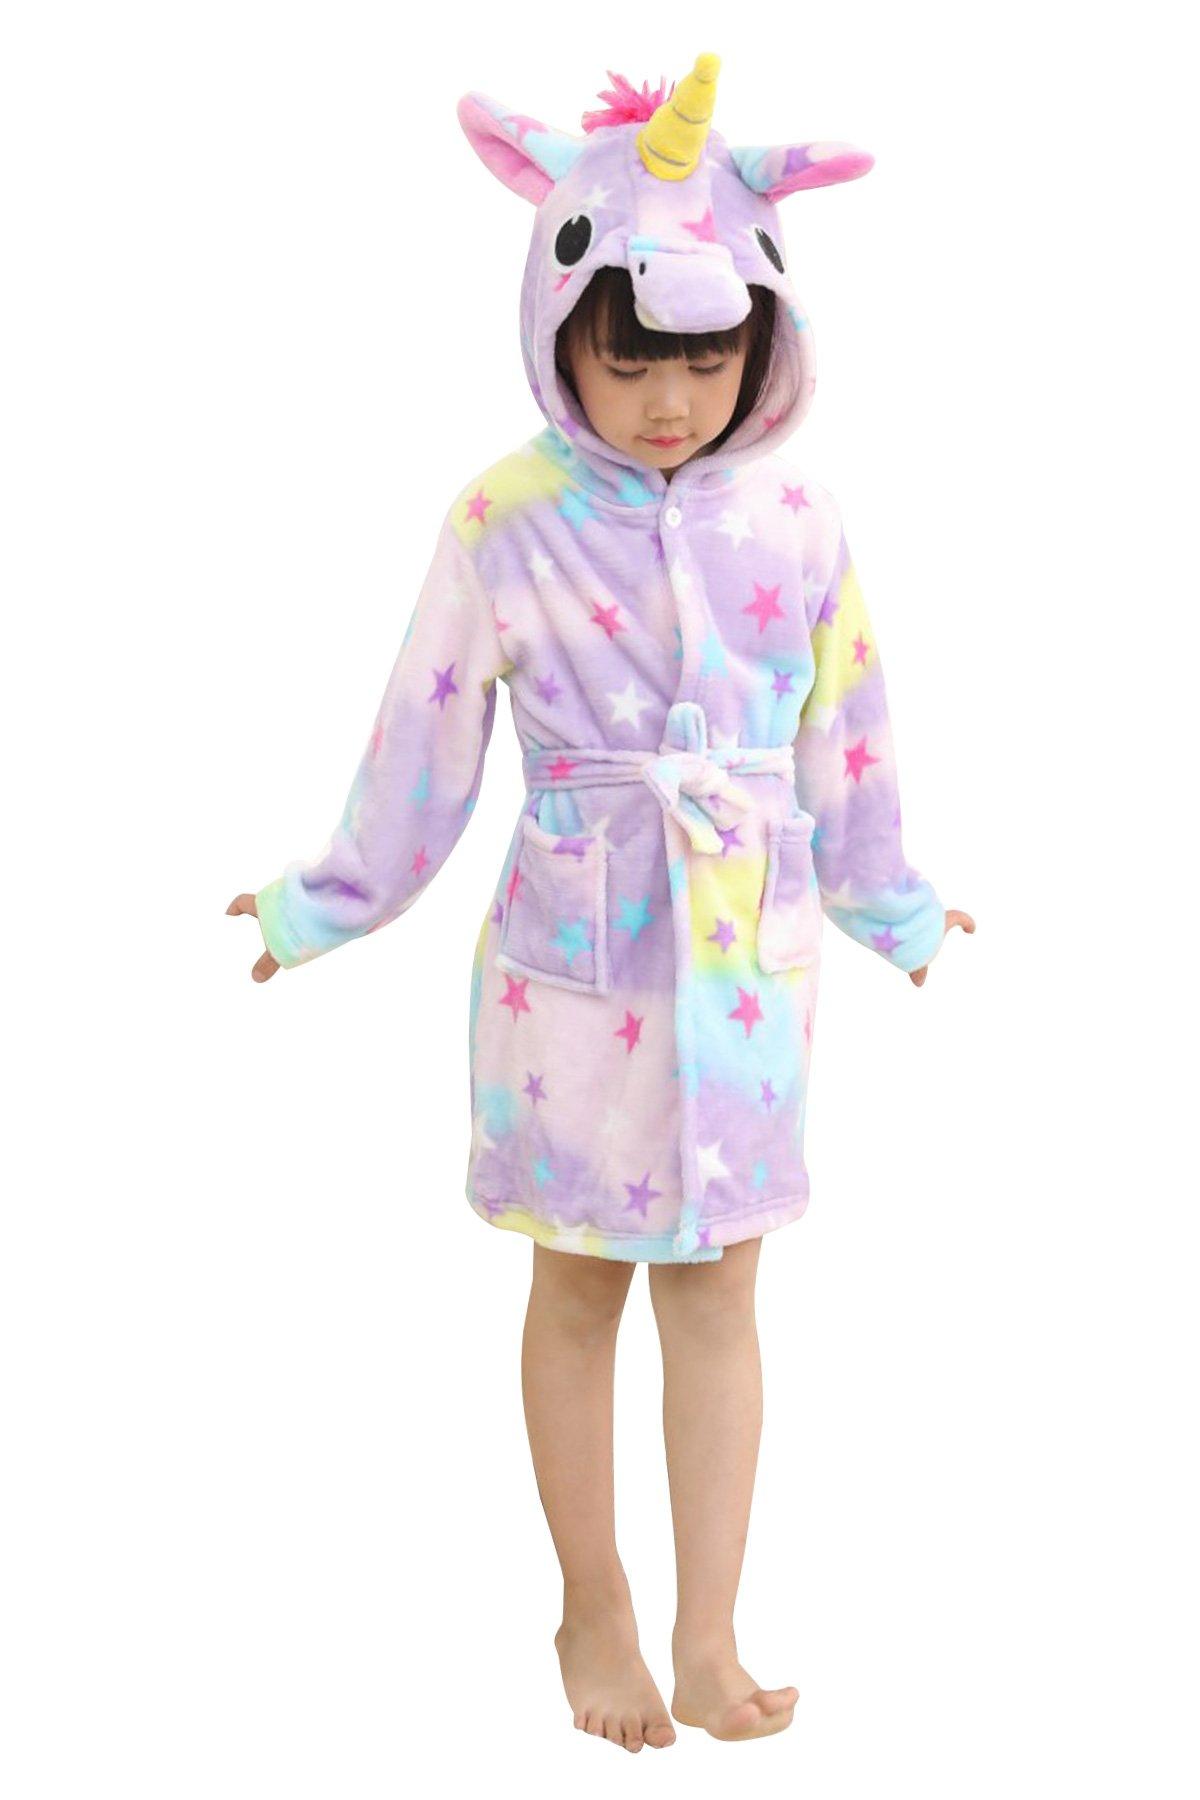 JOXJOZ Kids Unicorn Hooded Bathrobes Flannel Robe Pajamas Unisex Animal Sleepwear Gift (Stars, 100(Suggested Height35.4-39.4''))